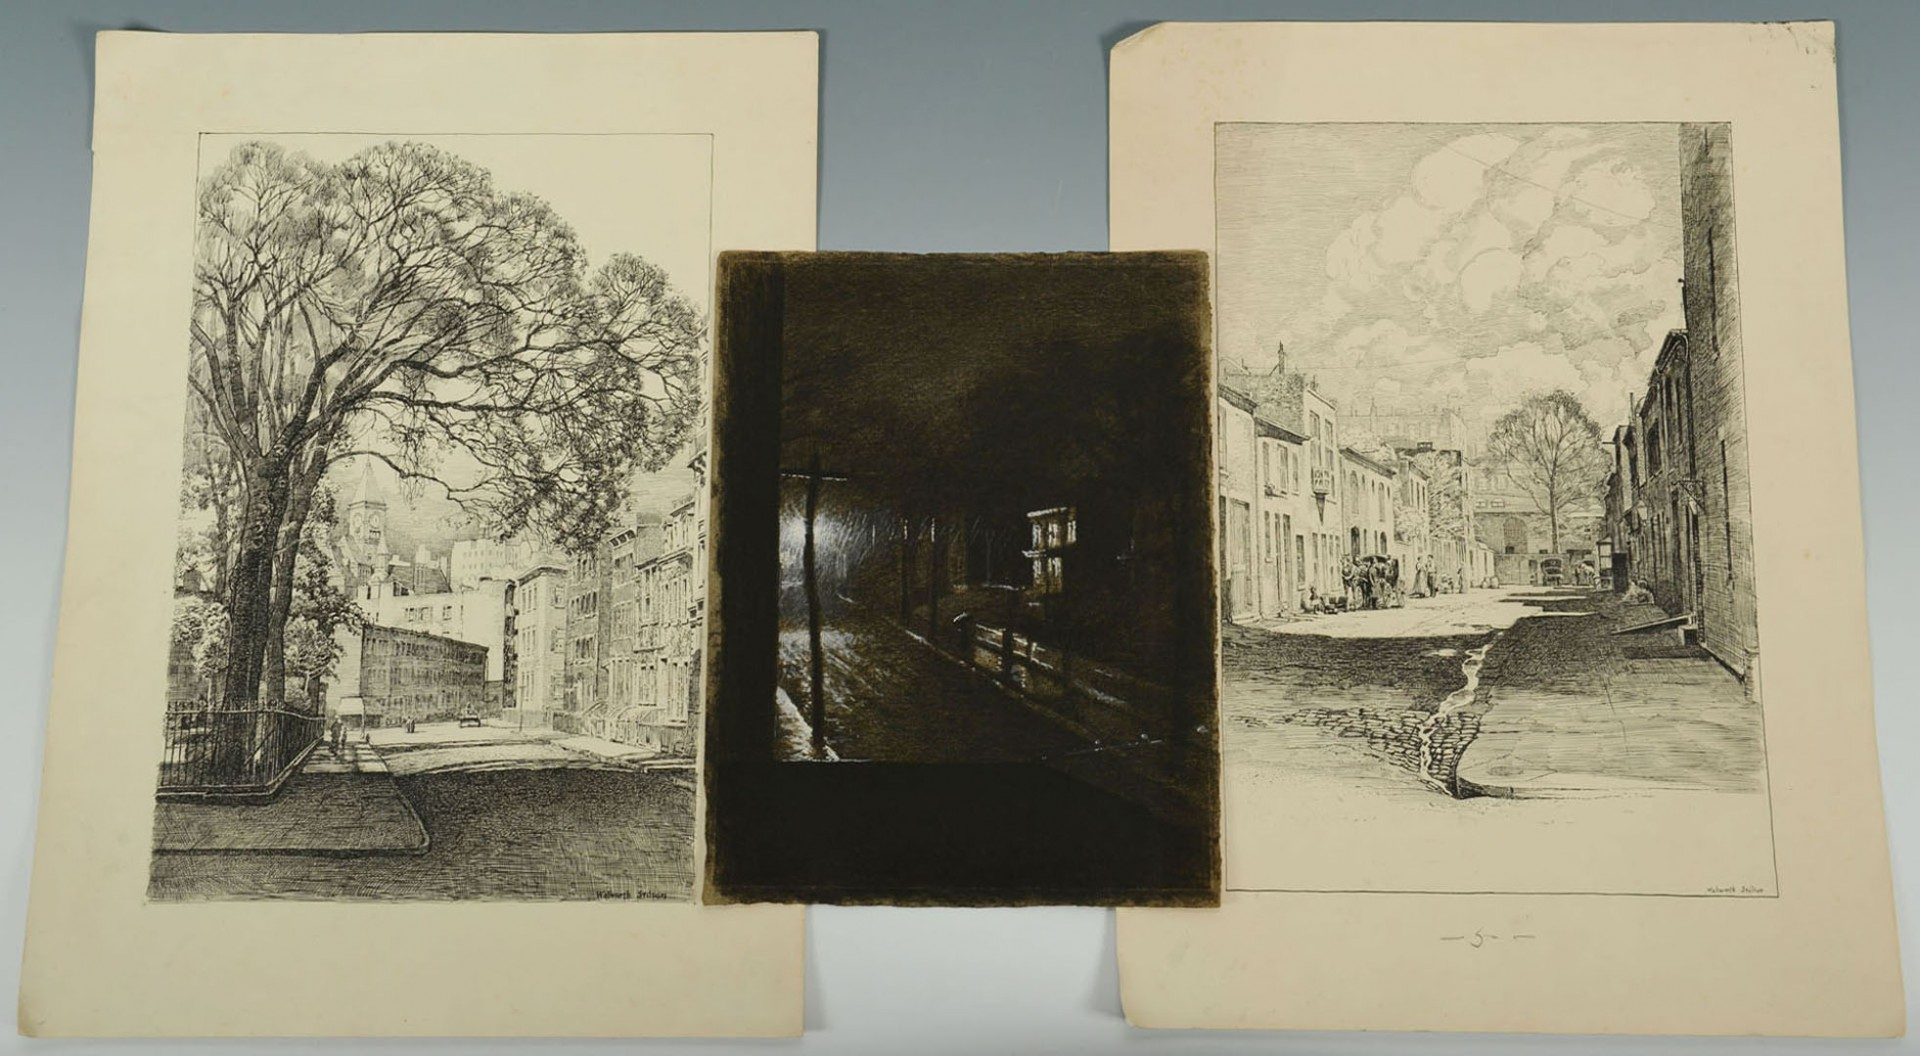 Lot 2872269: Walworth Stilson Works on Paper of Street Views